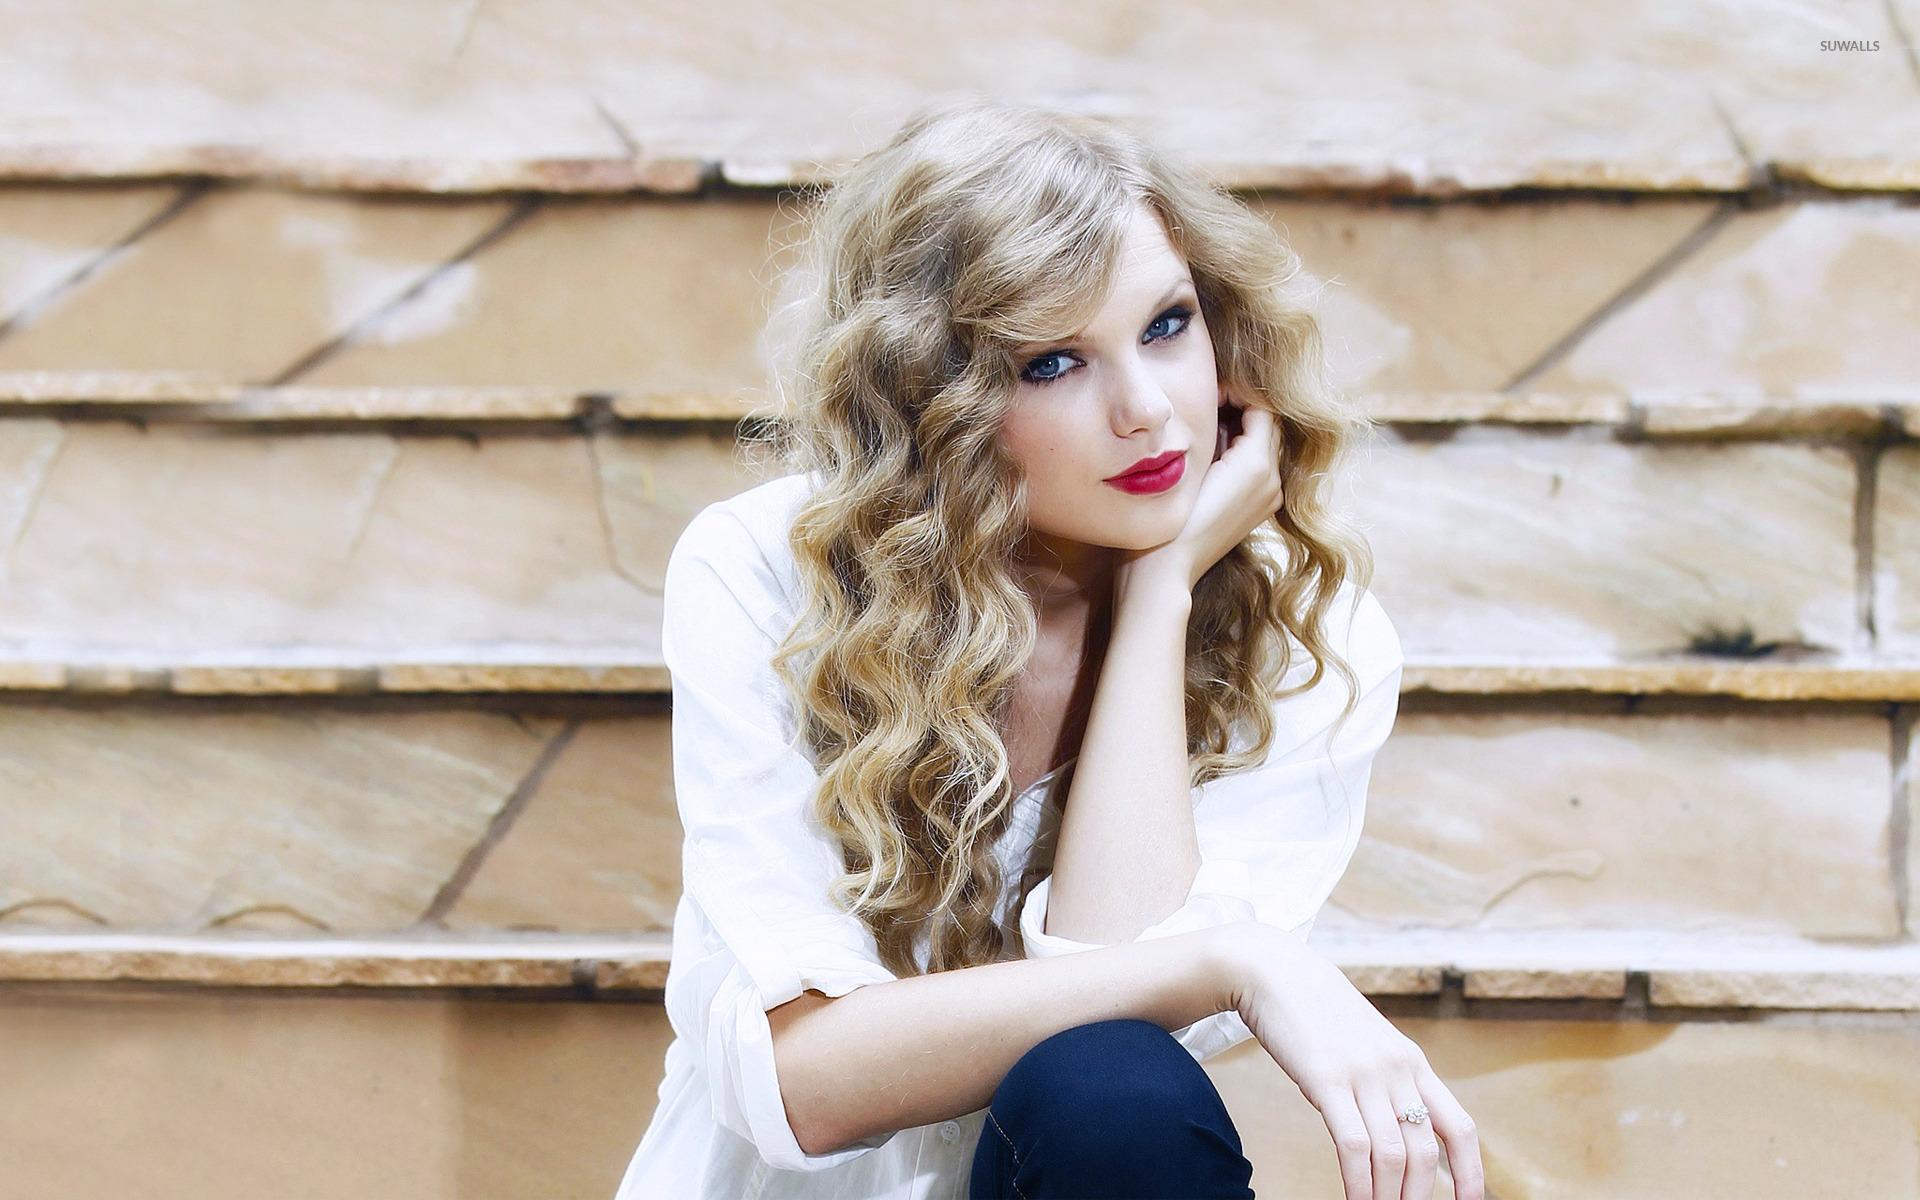 Taylor swift 22 wallpaper celebrity wallpapers 12721 taylor swift 22 wallpaper voltagebd Images